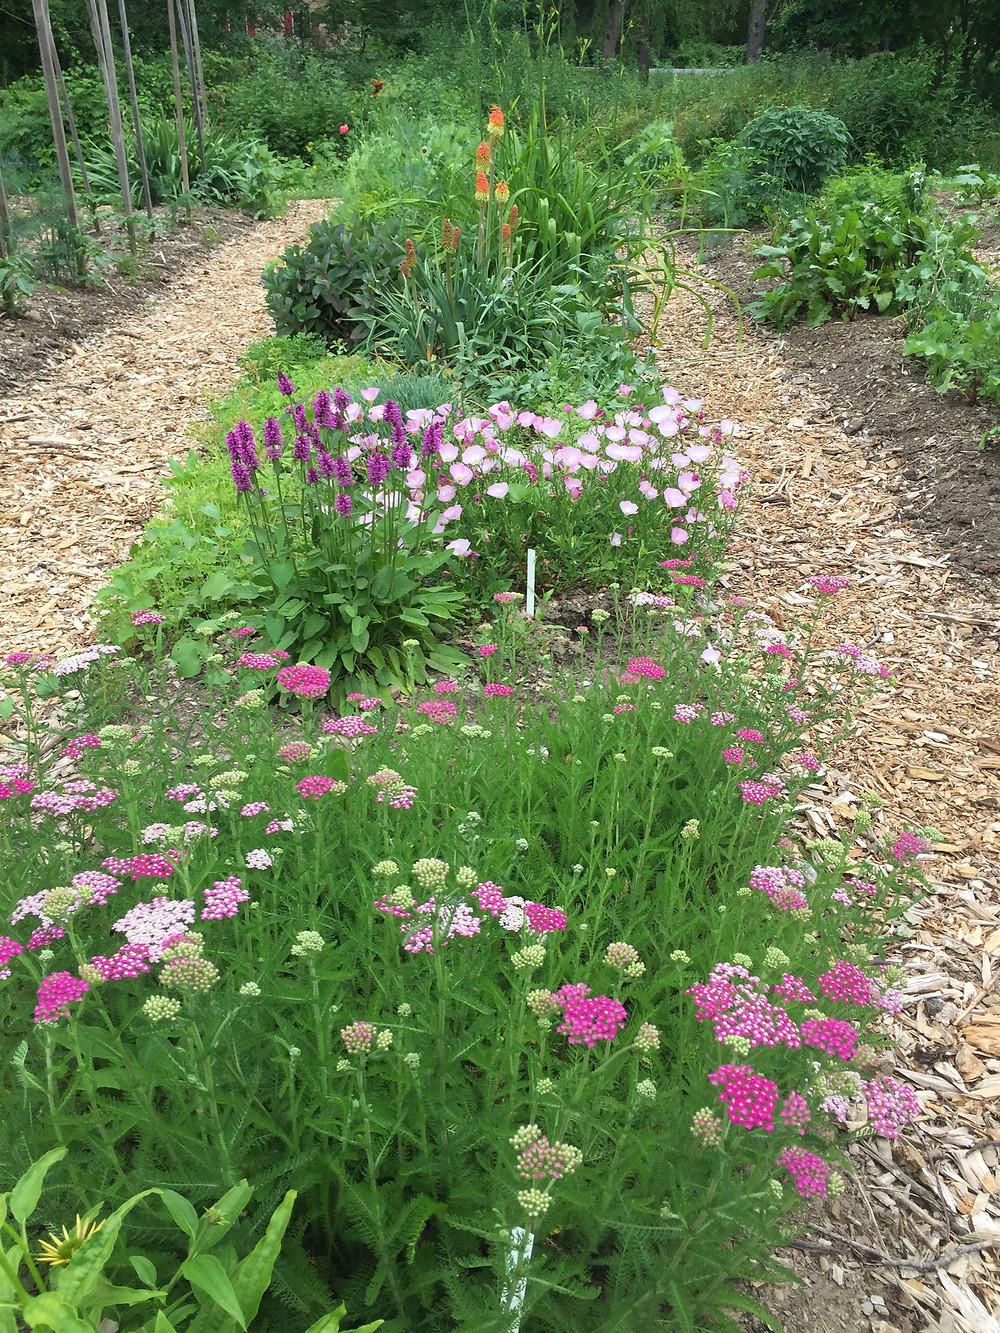 A full row in the garden